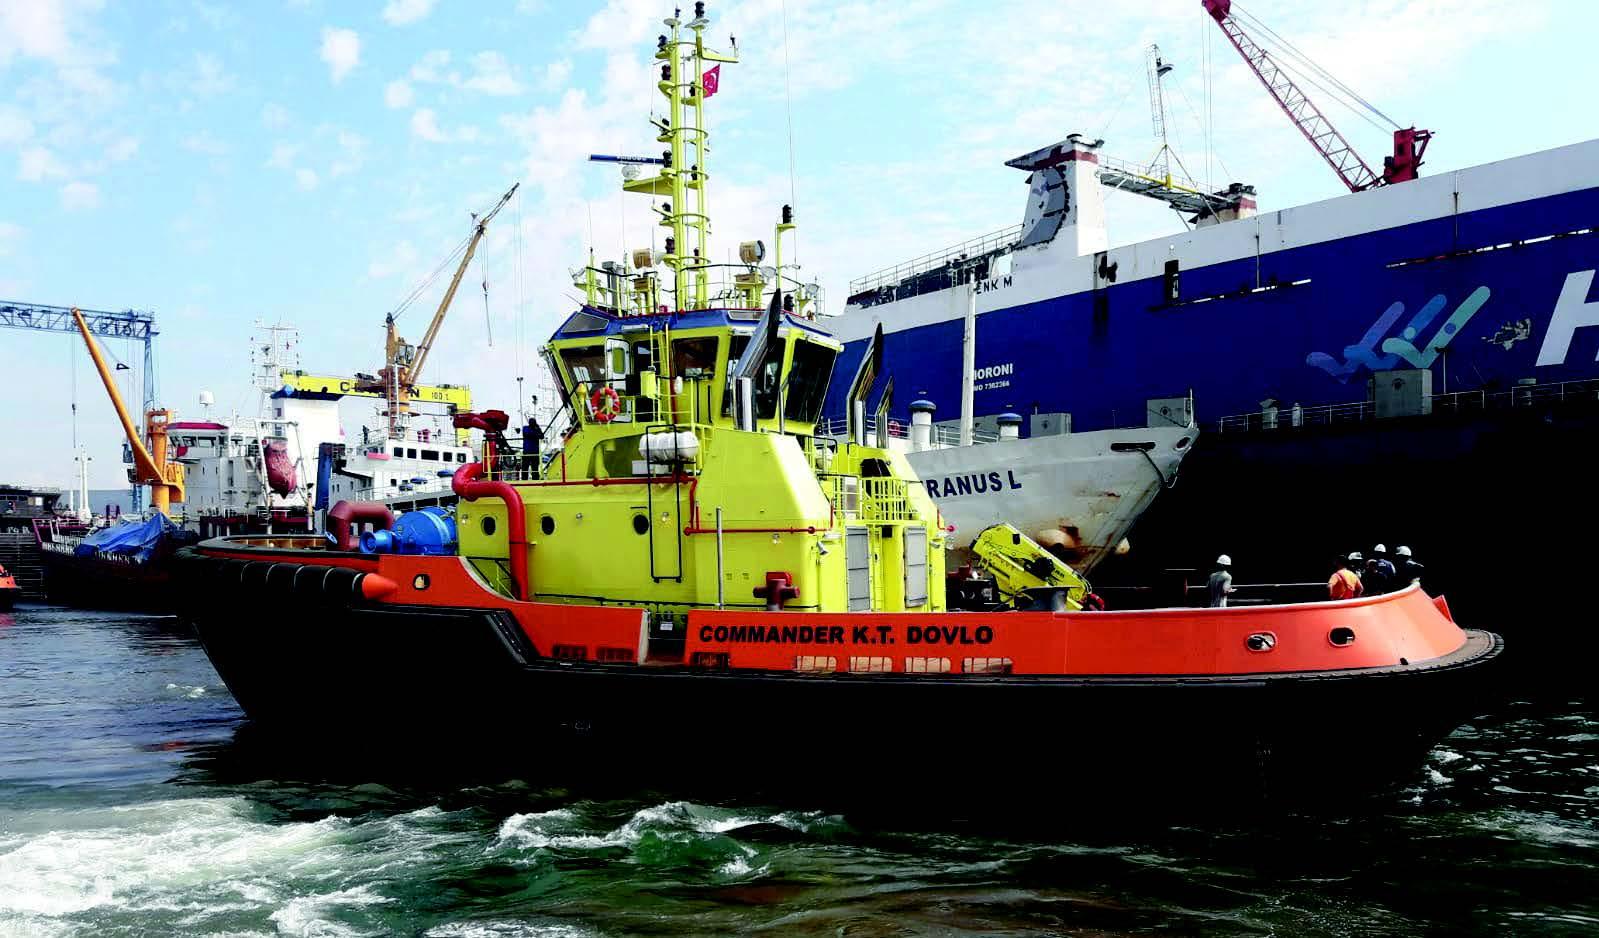 80 TBP FiFi Tug Boat